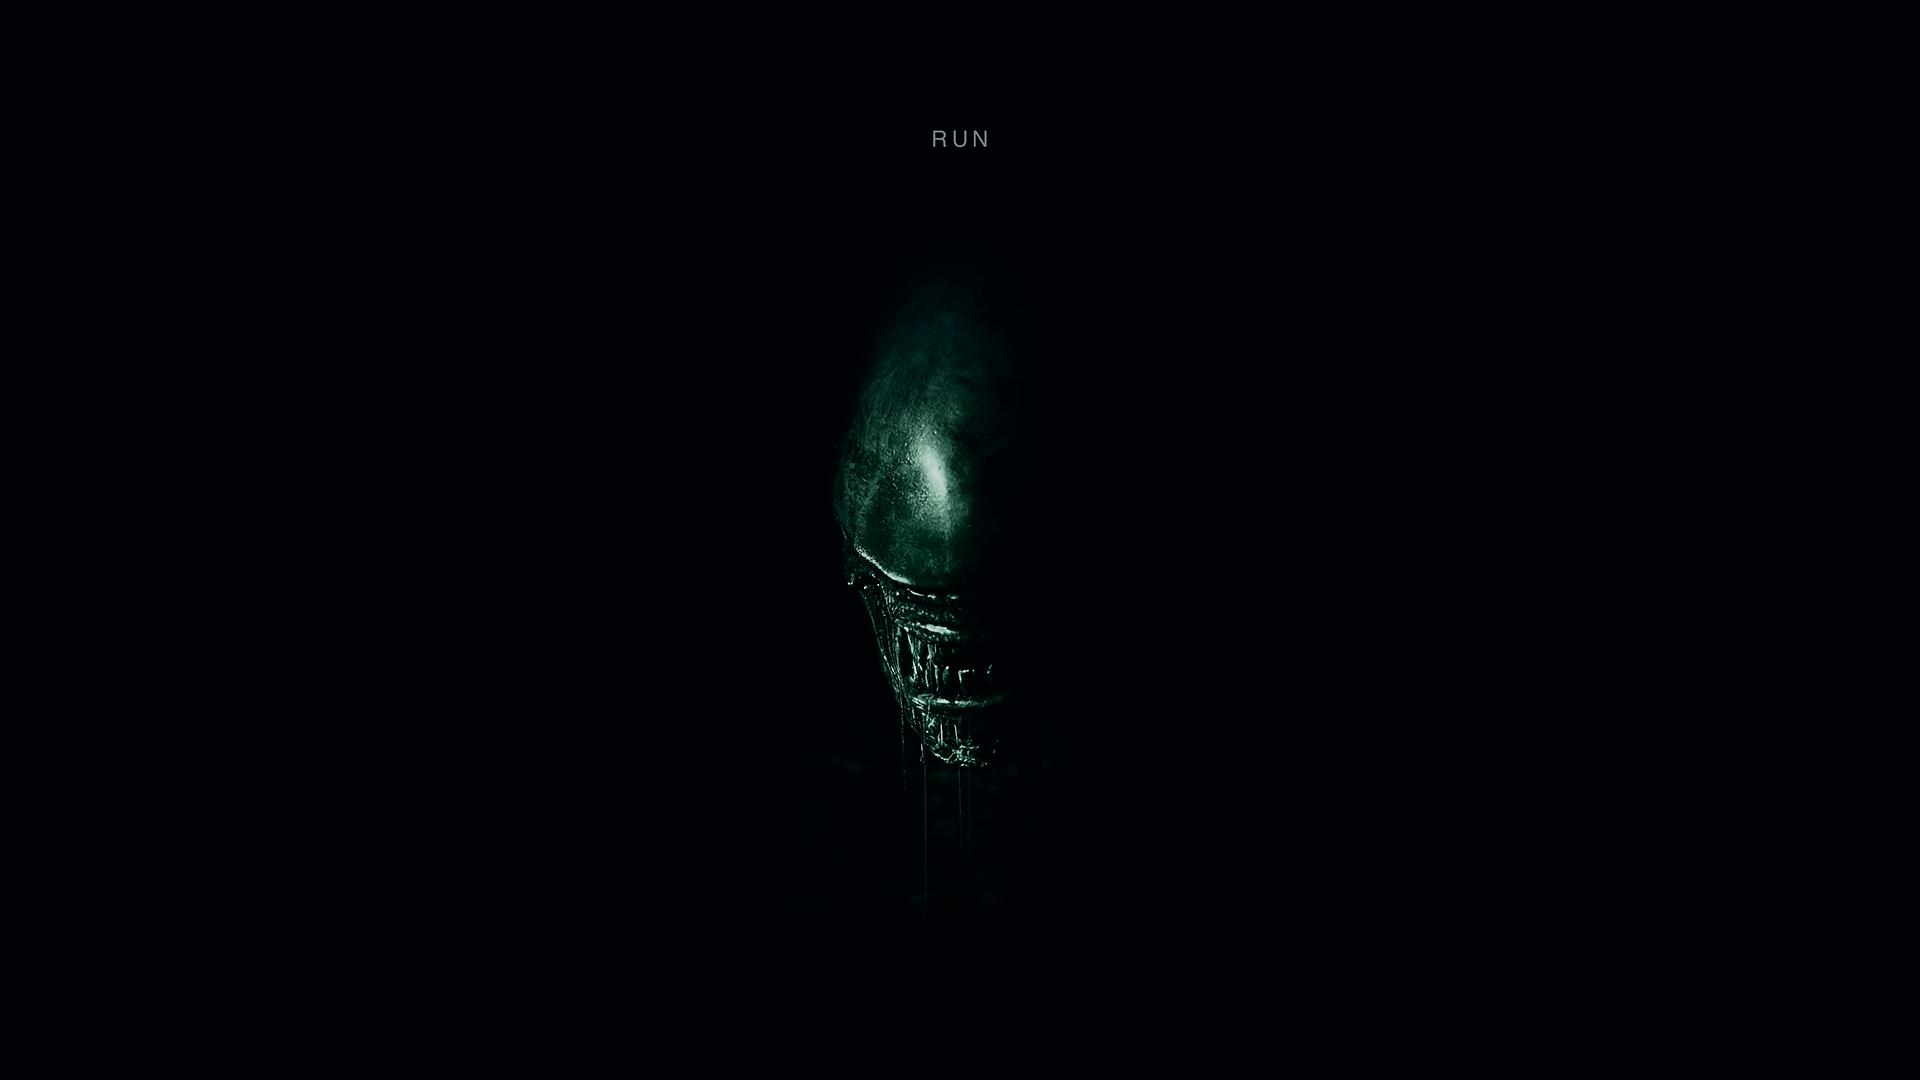 Alien covenant wallpapers pictures images - Alien desktop ...